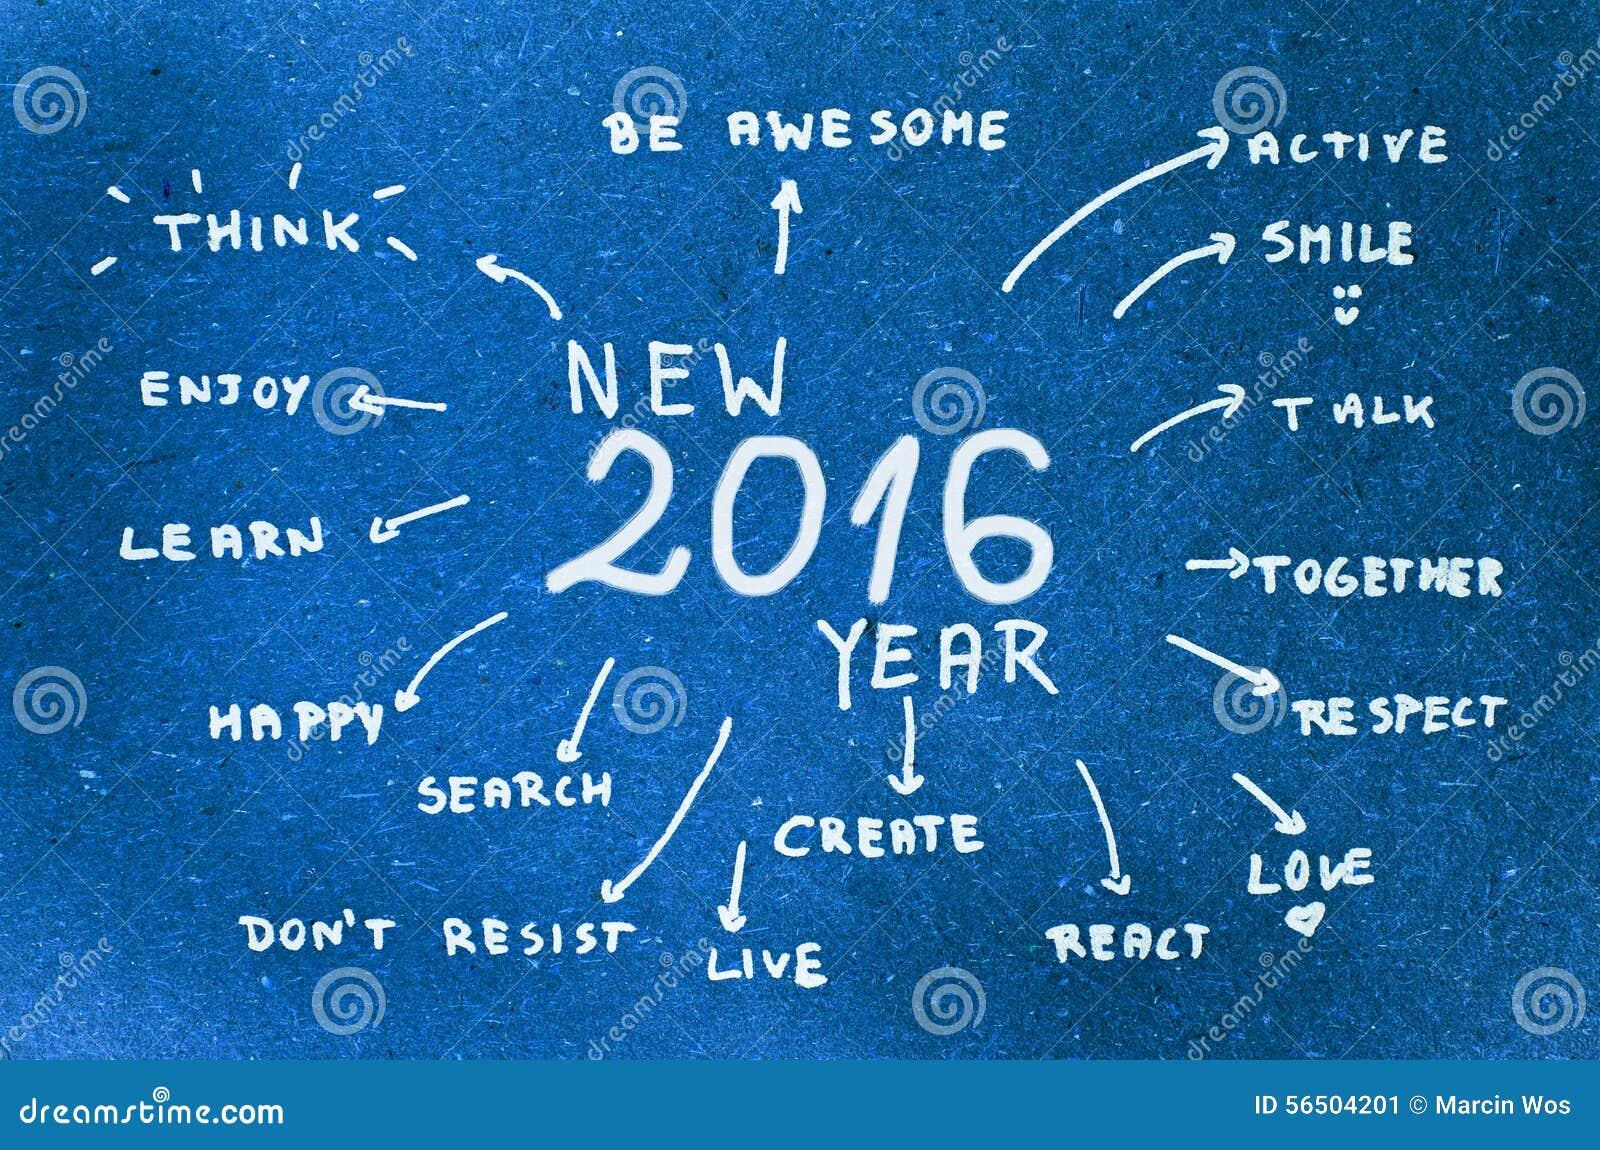 New Year 2016 Goals written on blue cardboard.